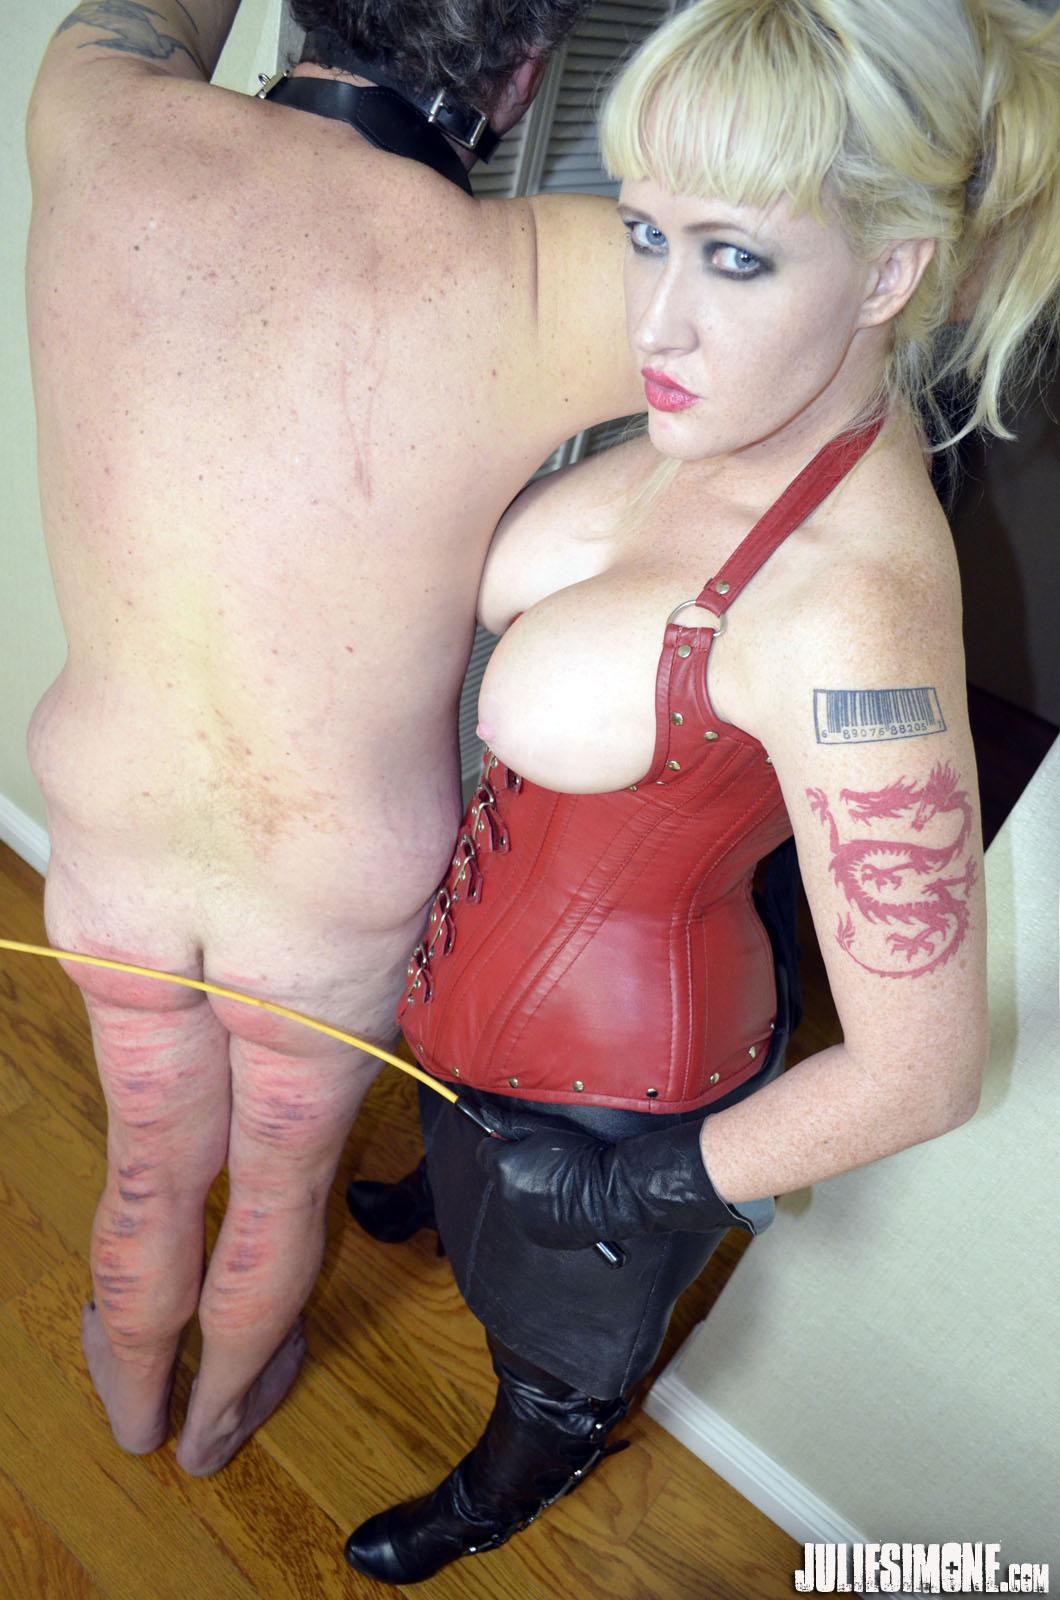 Barbi benton sex tape